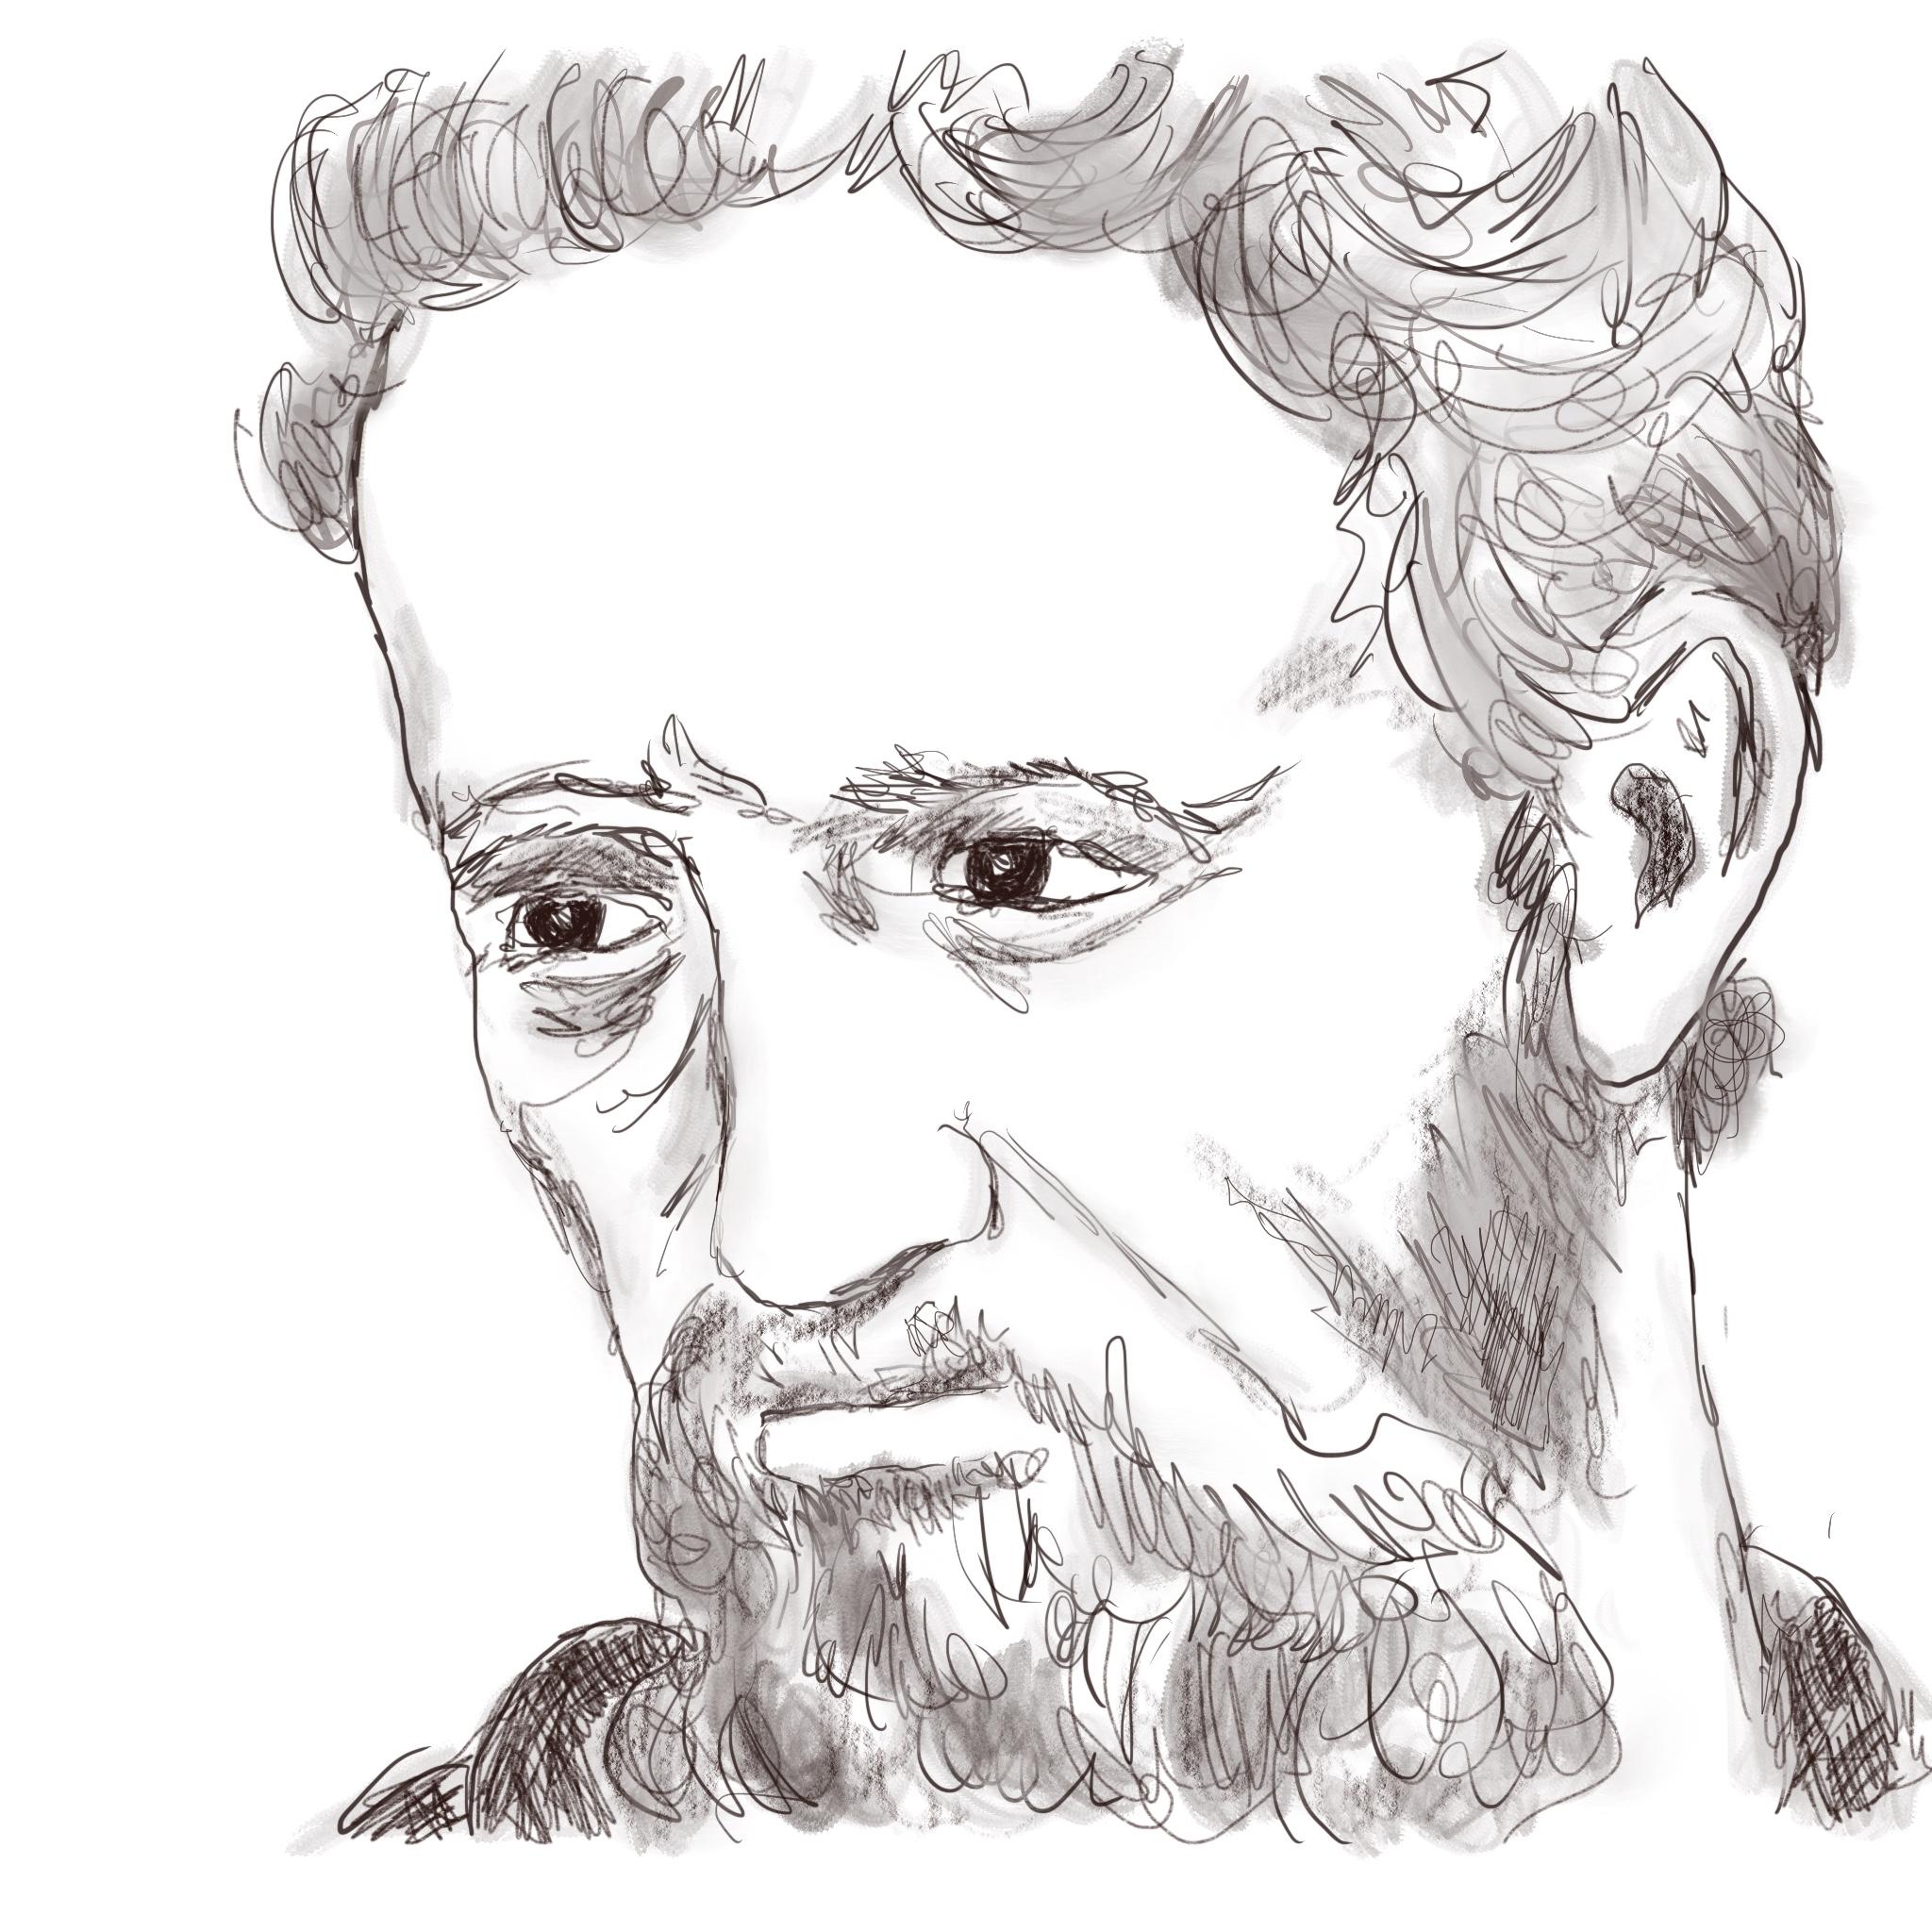 michelangelo sketch.JPG